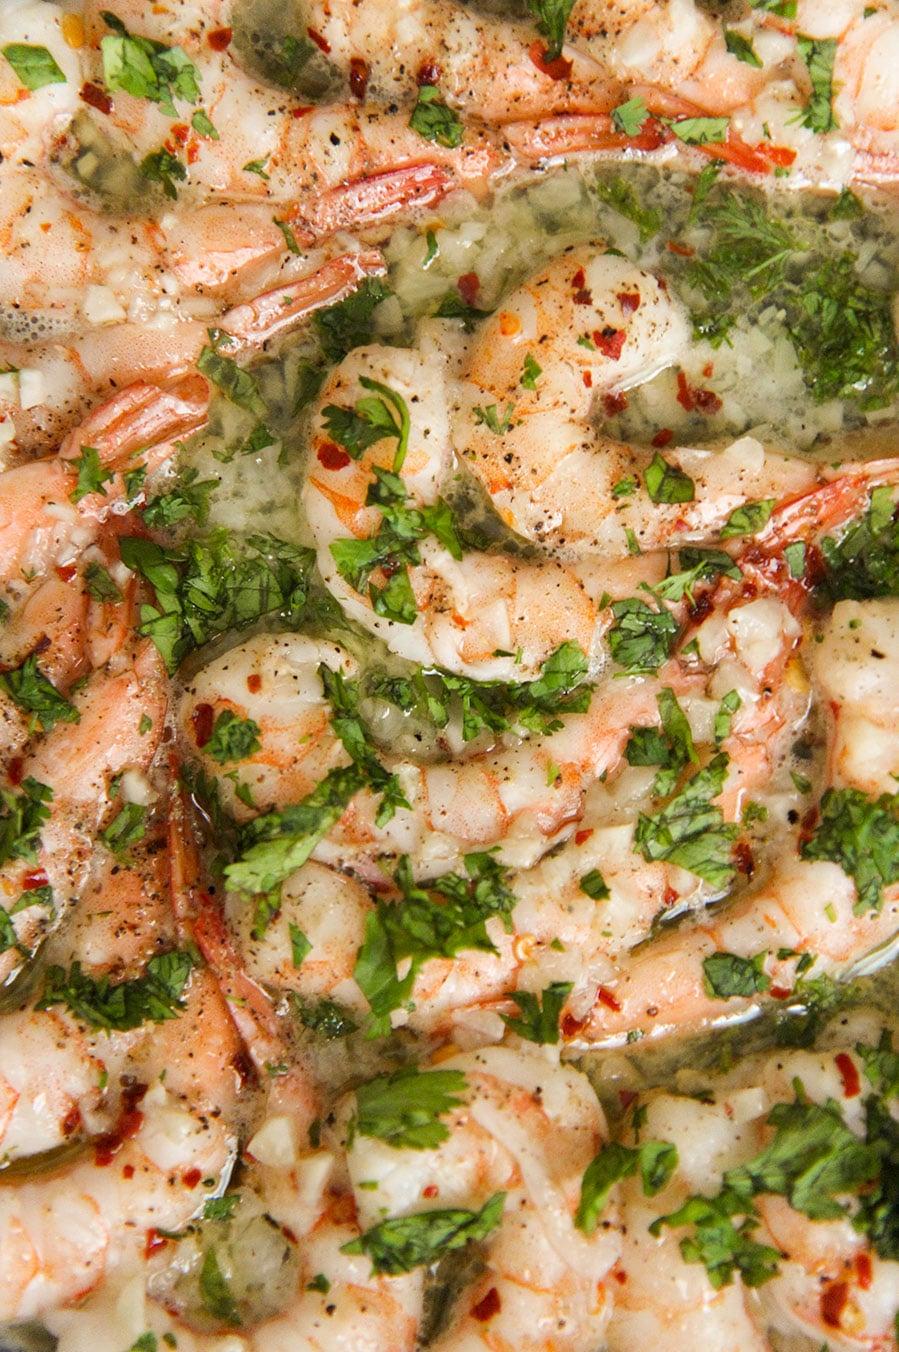 baked shrimp scampi up close.